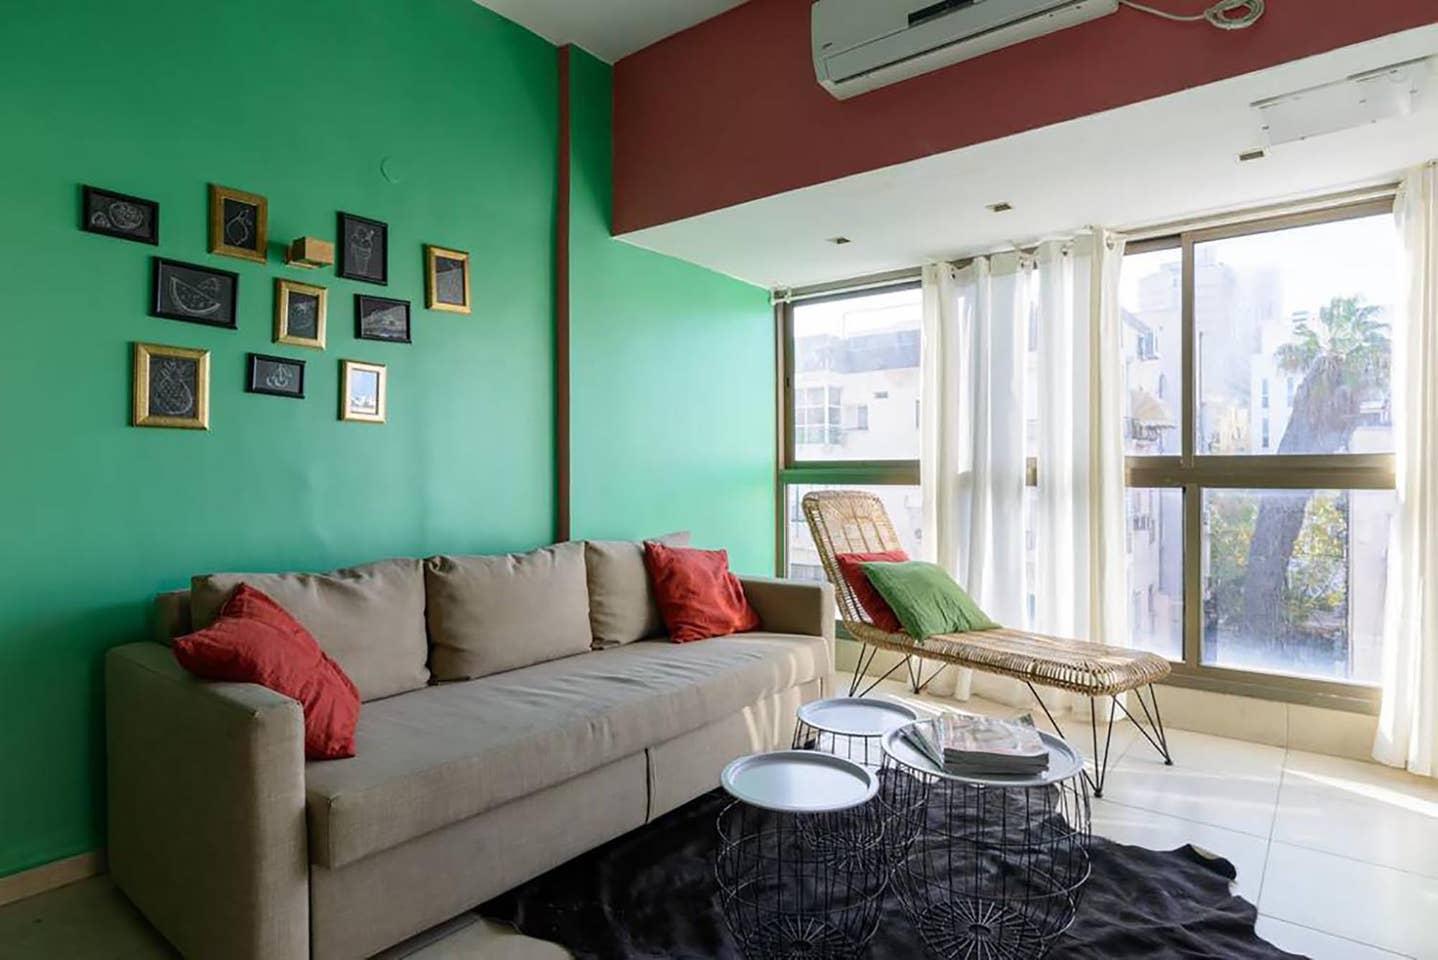 Apartment Tropical sensation next to the beach TLV photo 18168683